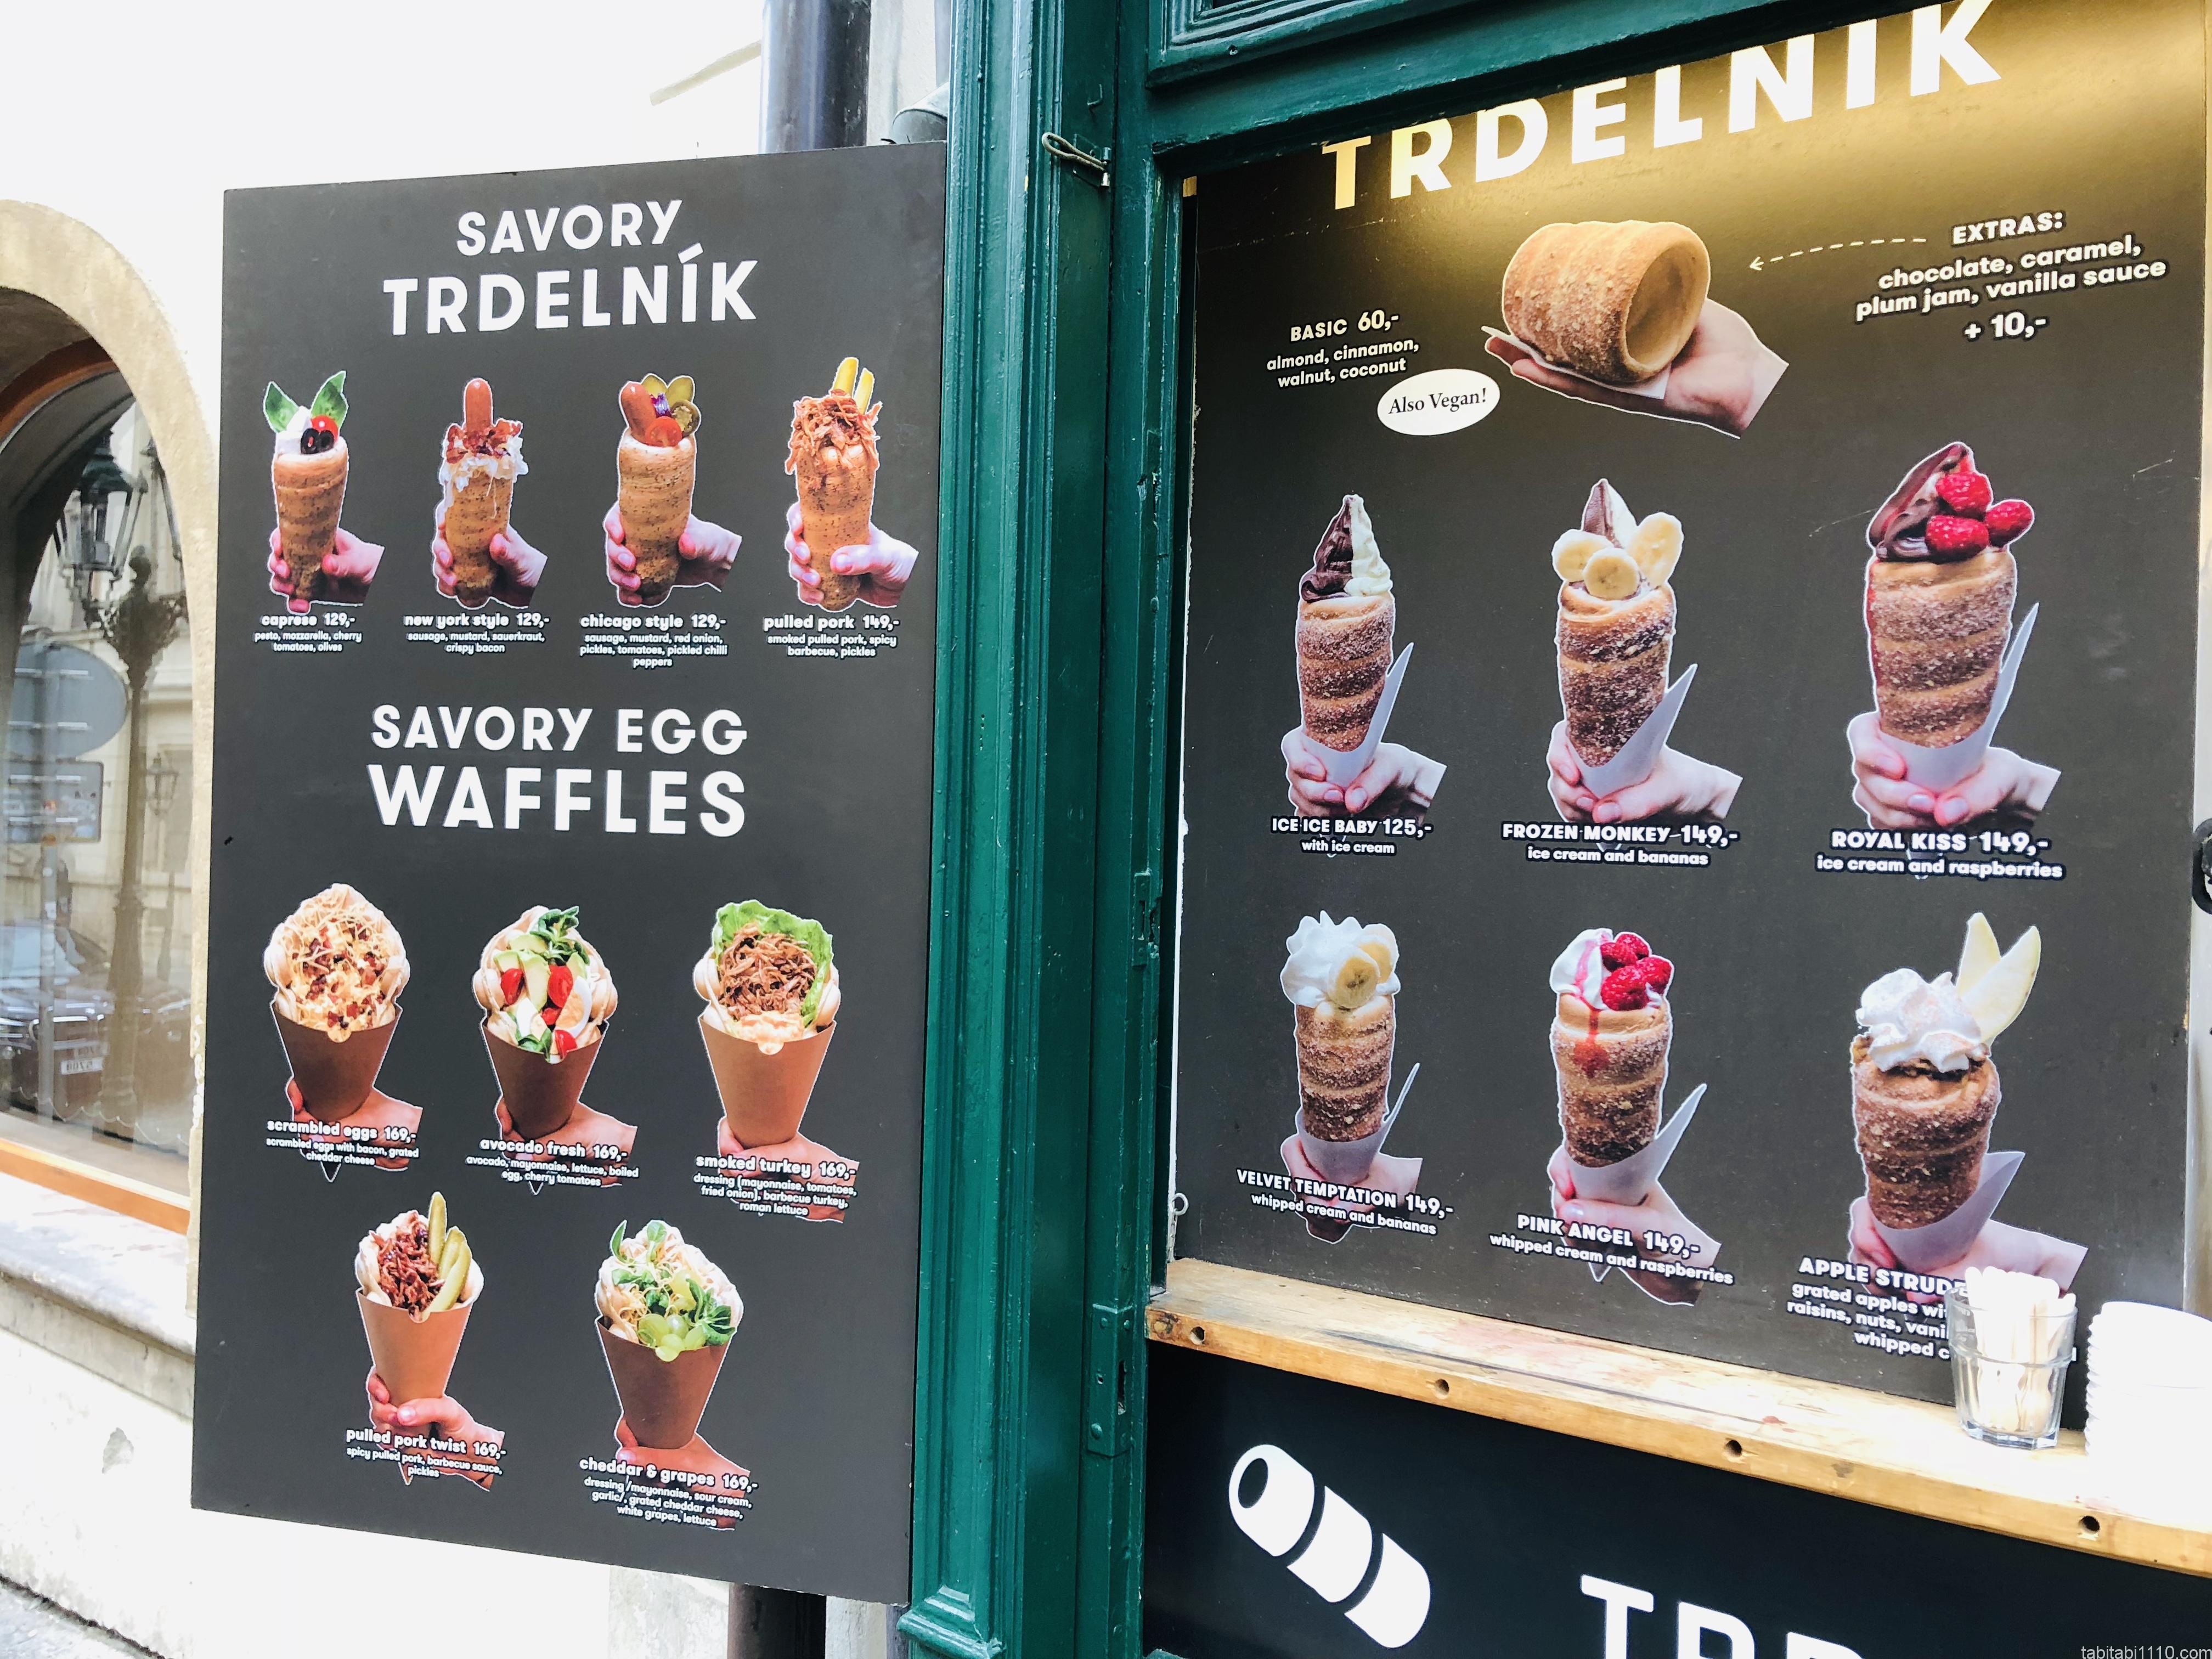 Waffle Point U Kajetana|メニュー